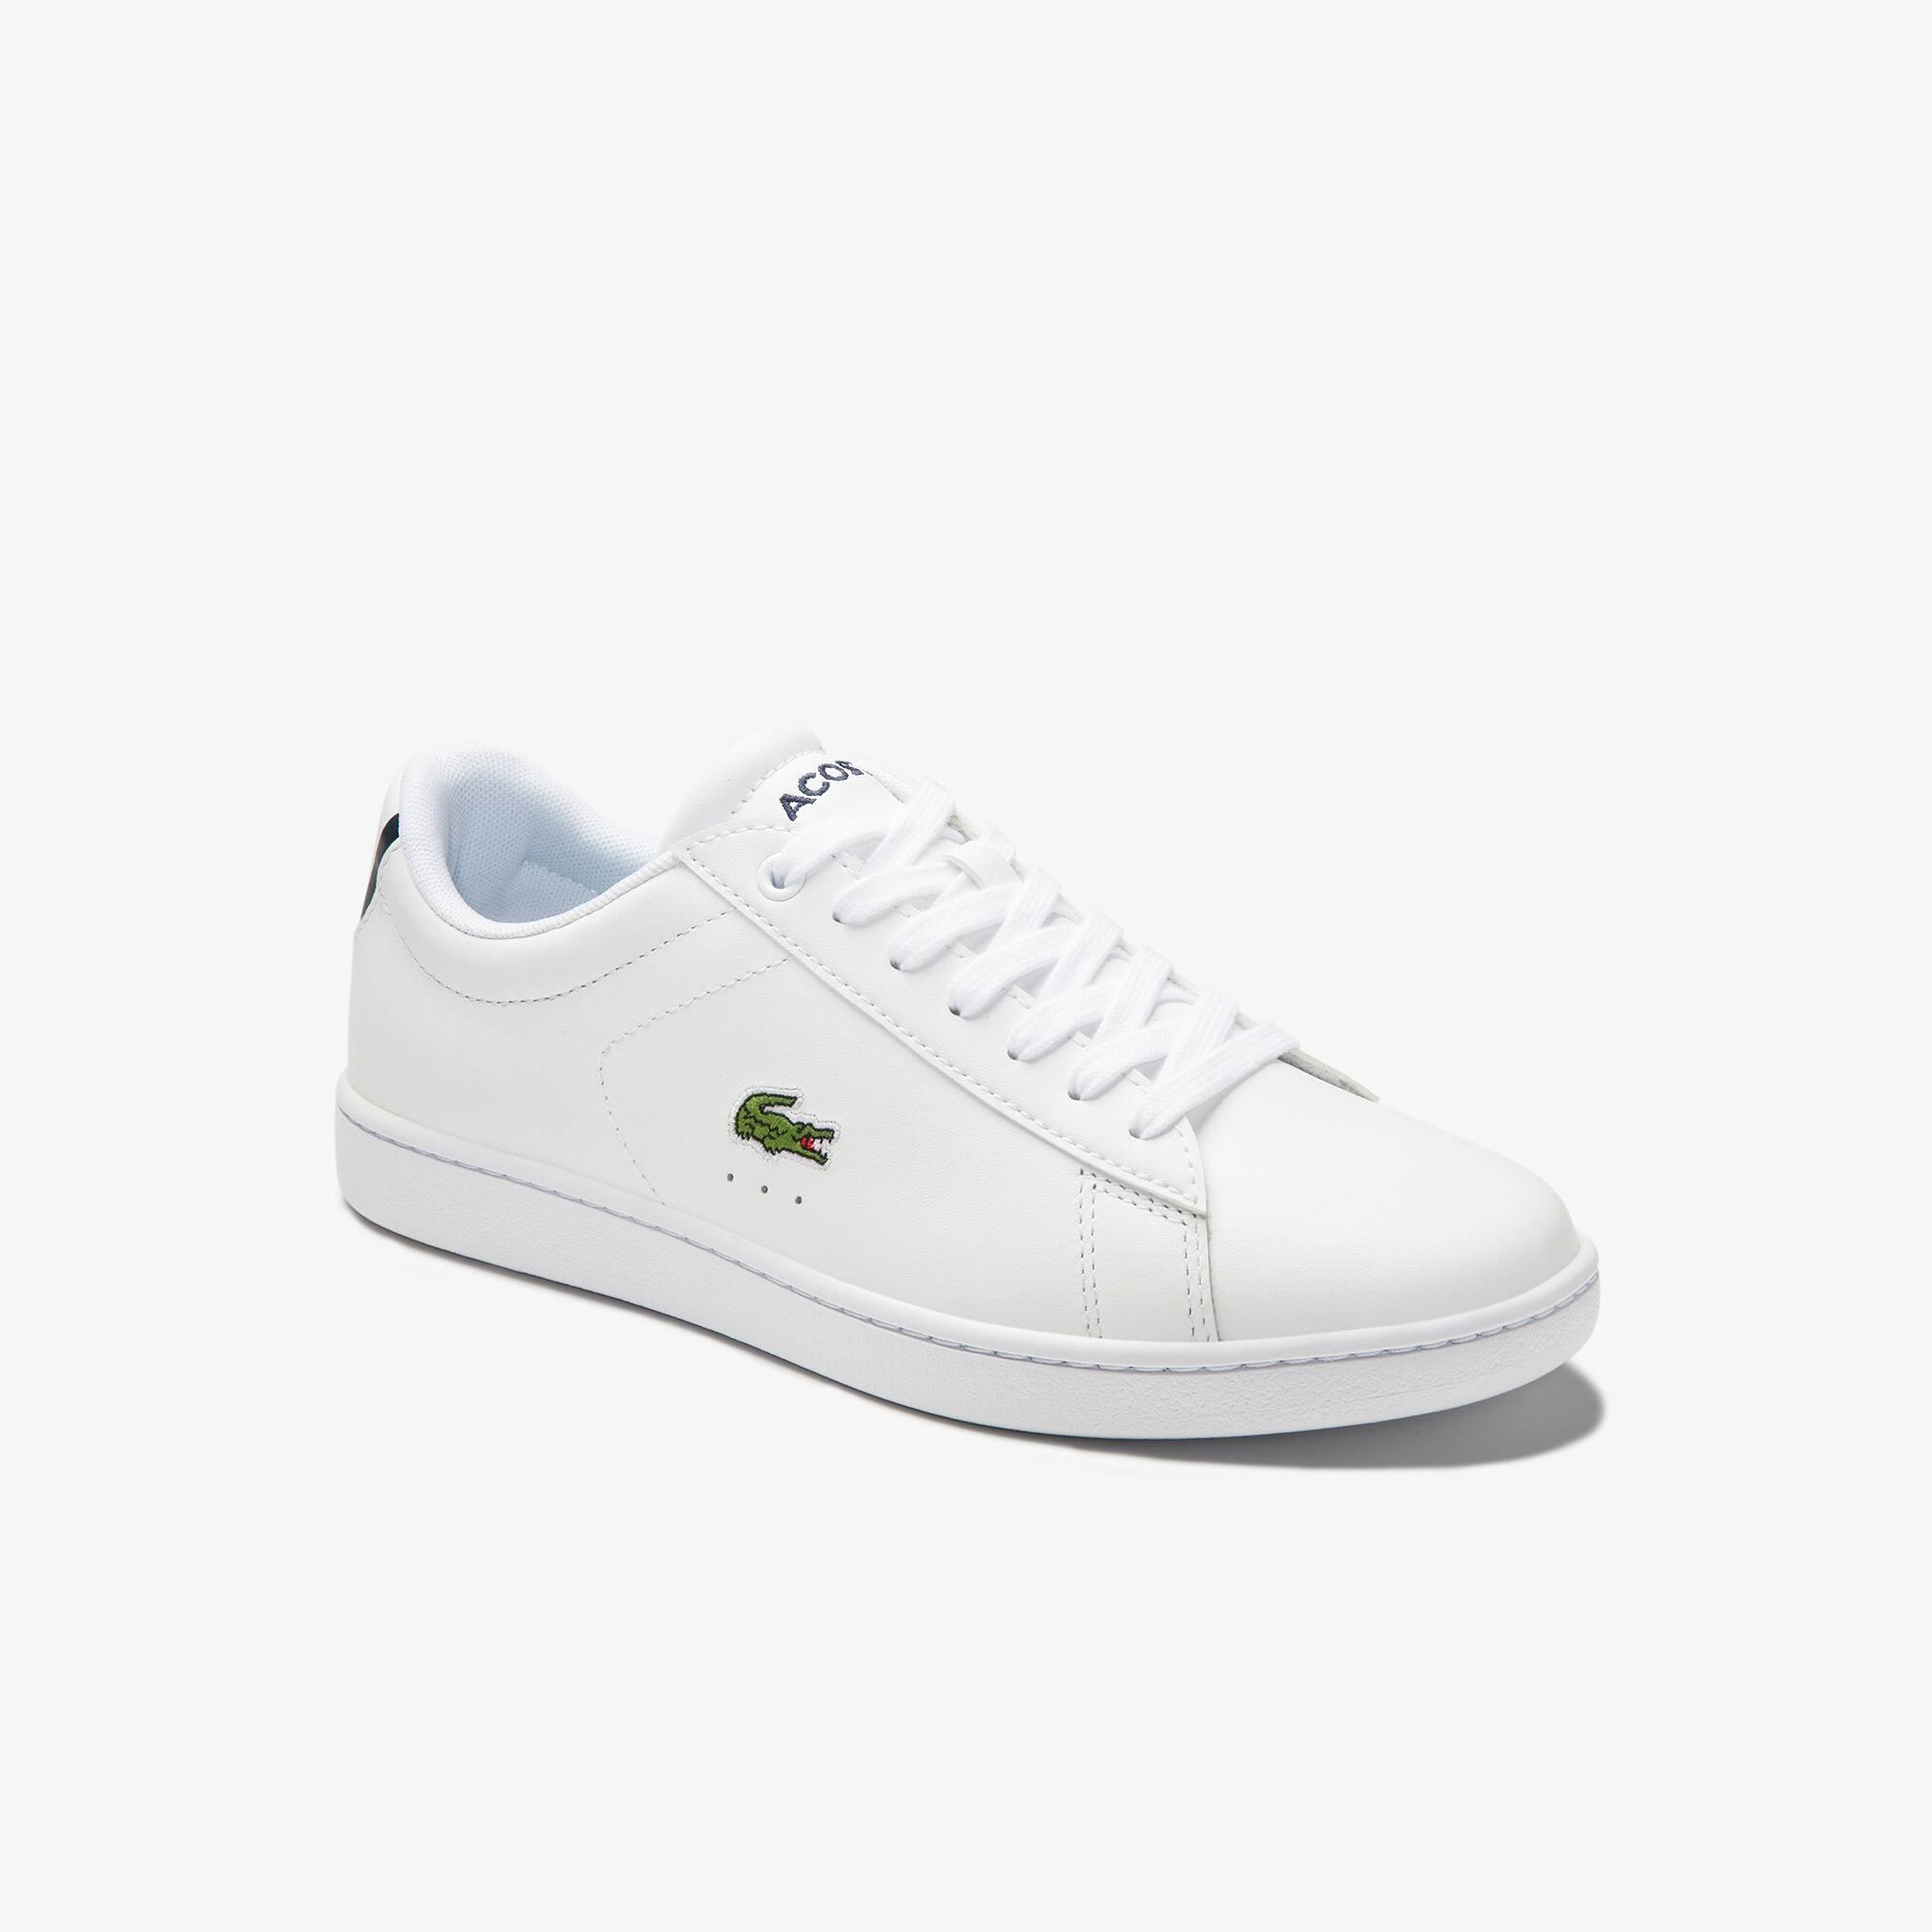 Damen-Sneakers CARNABY EVO aus Leder